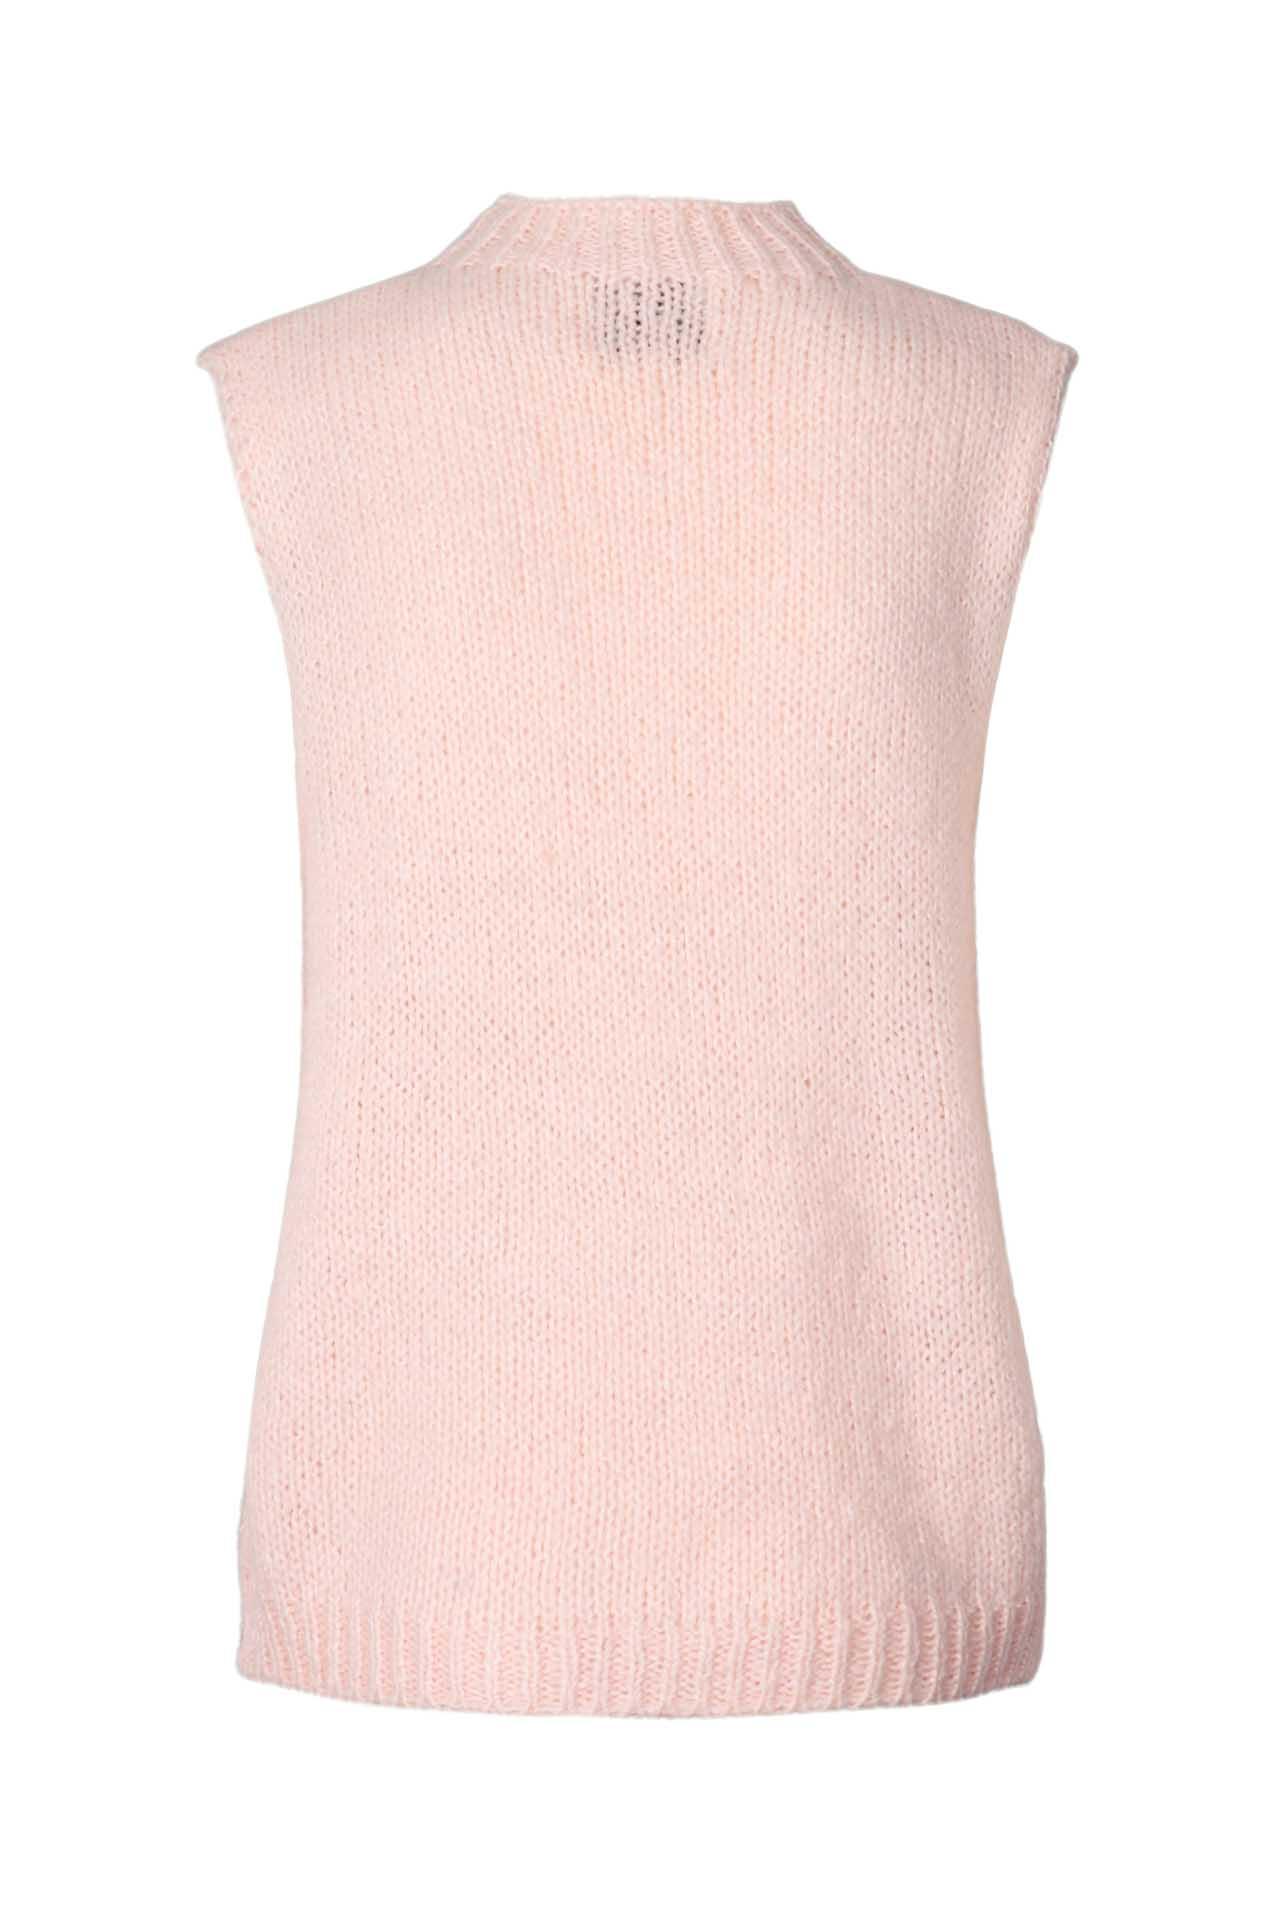 Lollys Laundry Rosa vest, light pink, large